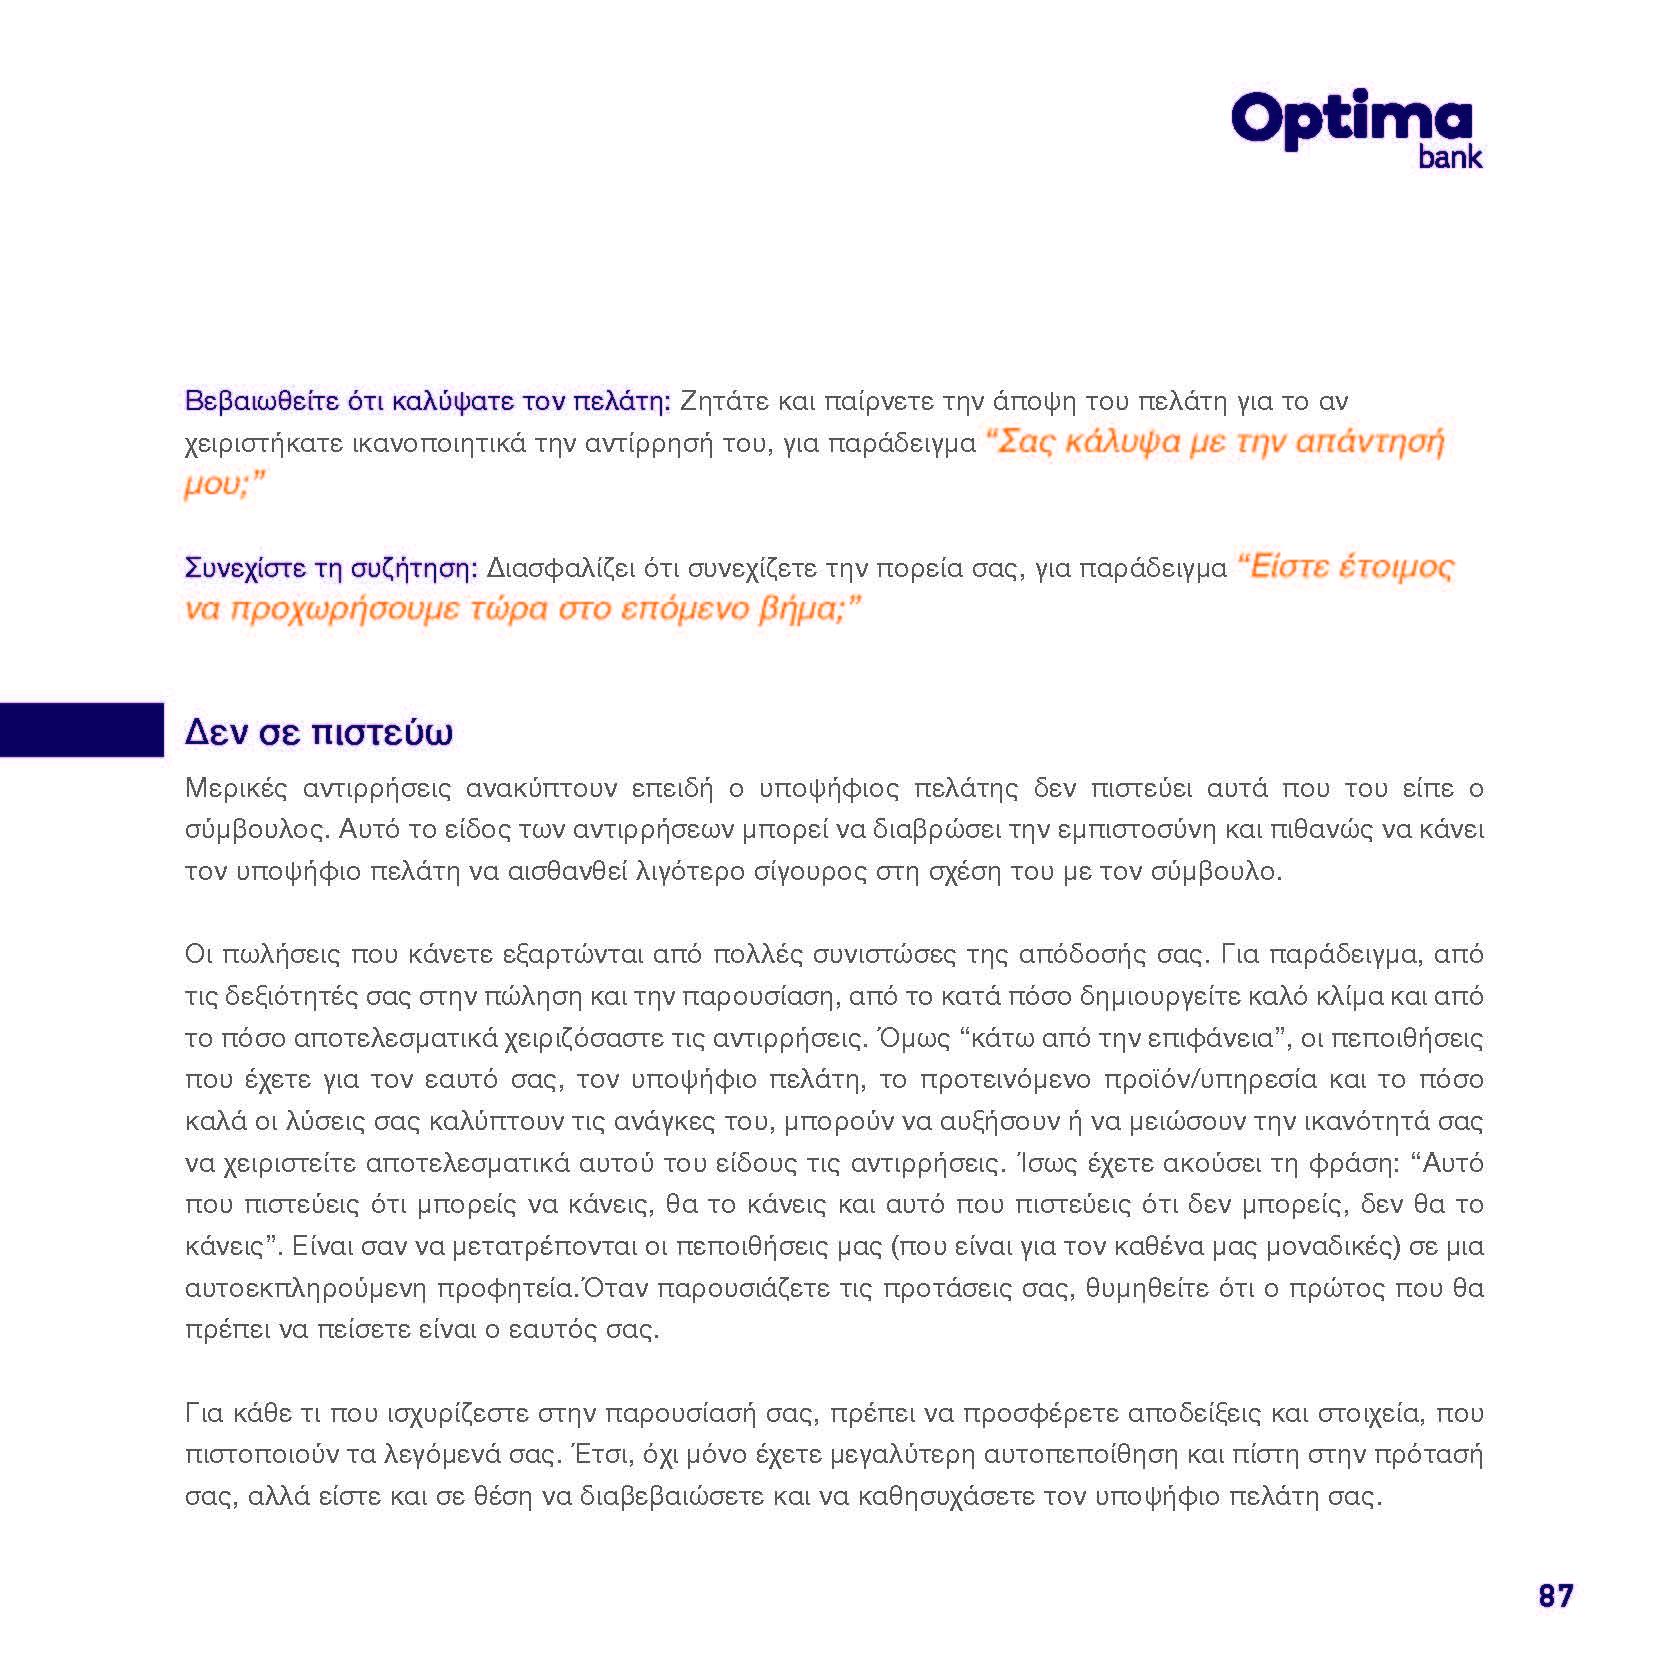 https://www.jib.gr/wp-content/uploads/2020/09/OPTIMA-BANK-BOOKLET-WEB_Page_087.jpg